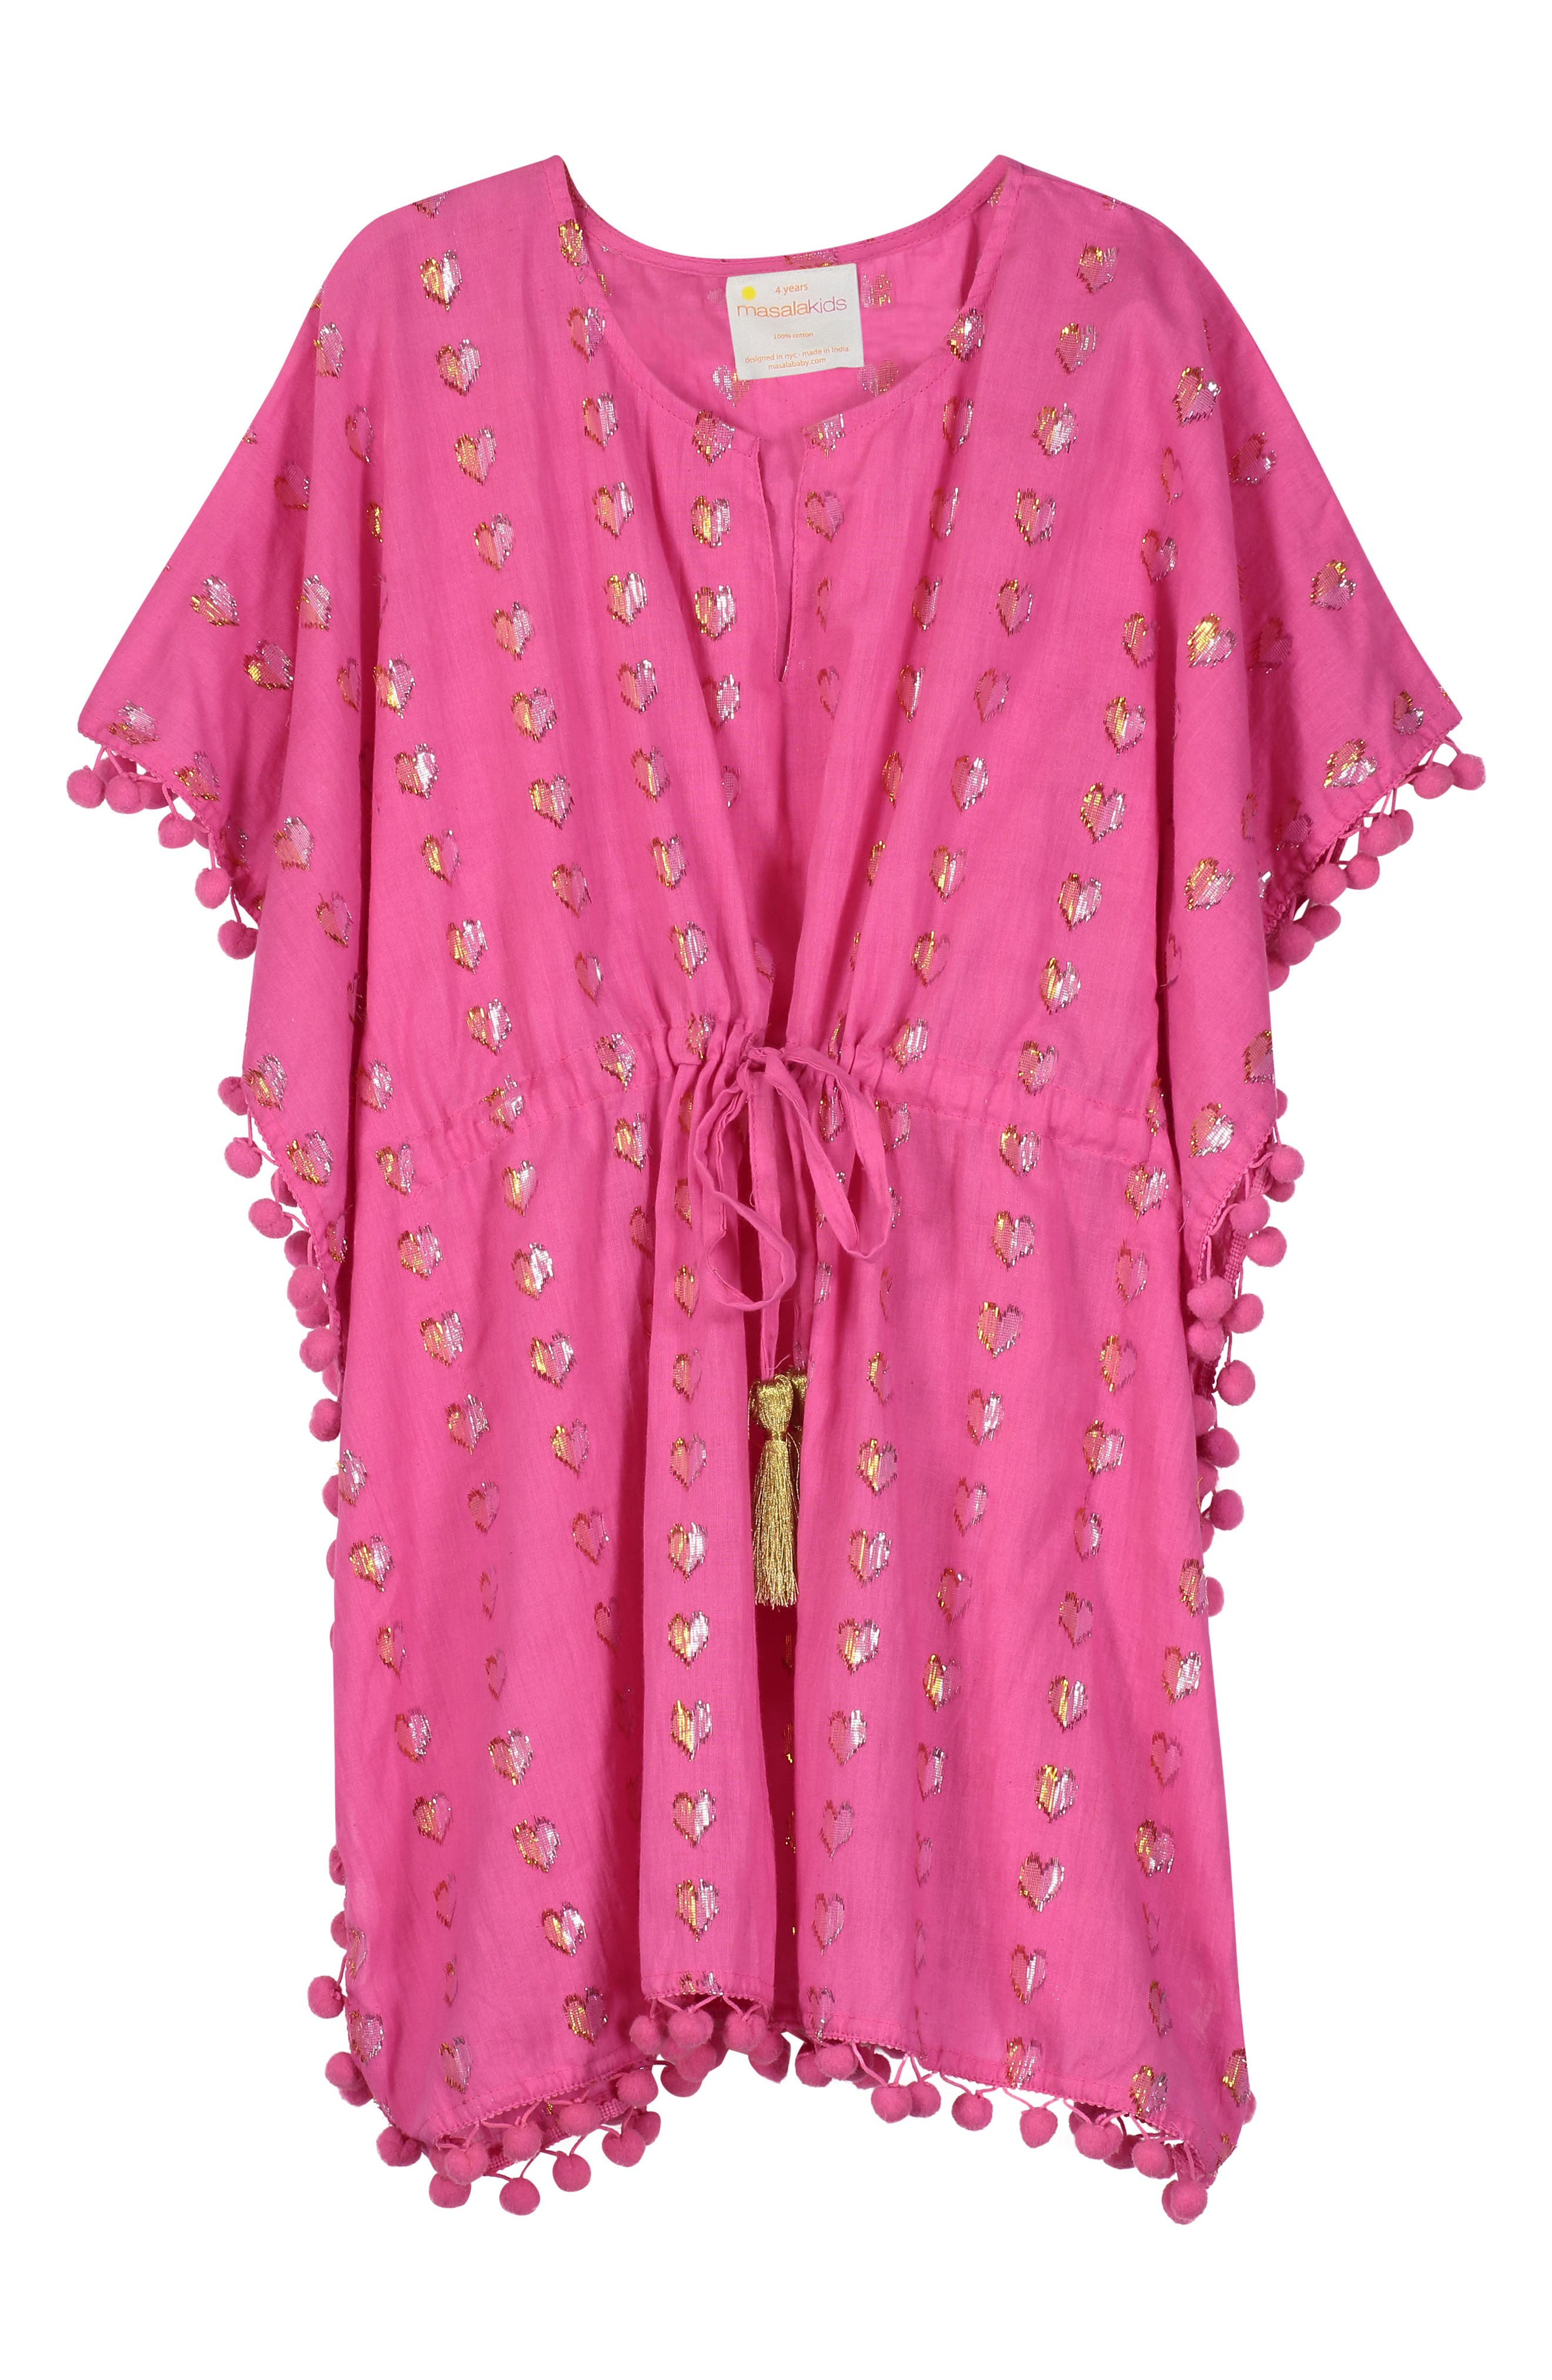 Infant Girls Masala Baby Diu Metallic Hearts CoverUp Caftan Size XXS (312m)  Pink